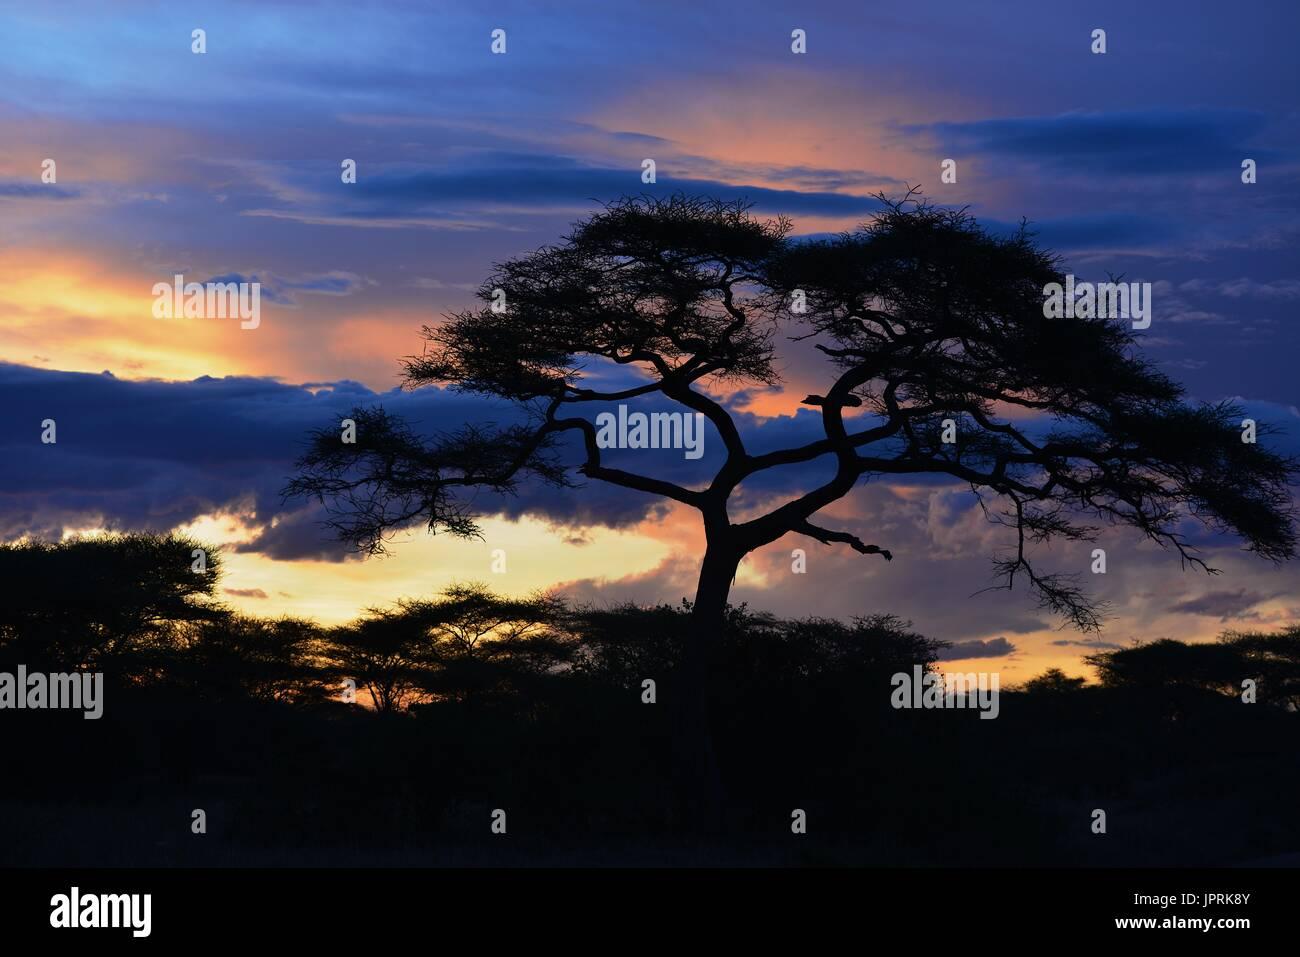 African Safari Landscape in Tanzania - Stock Image